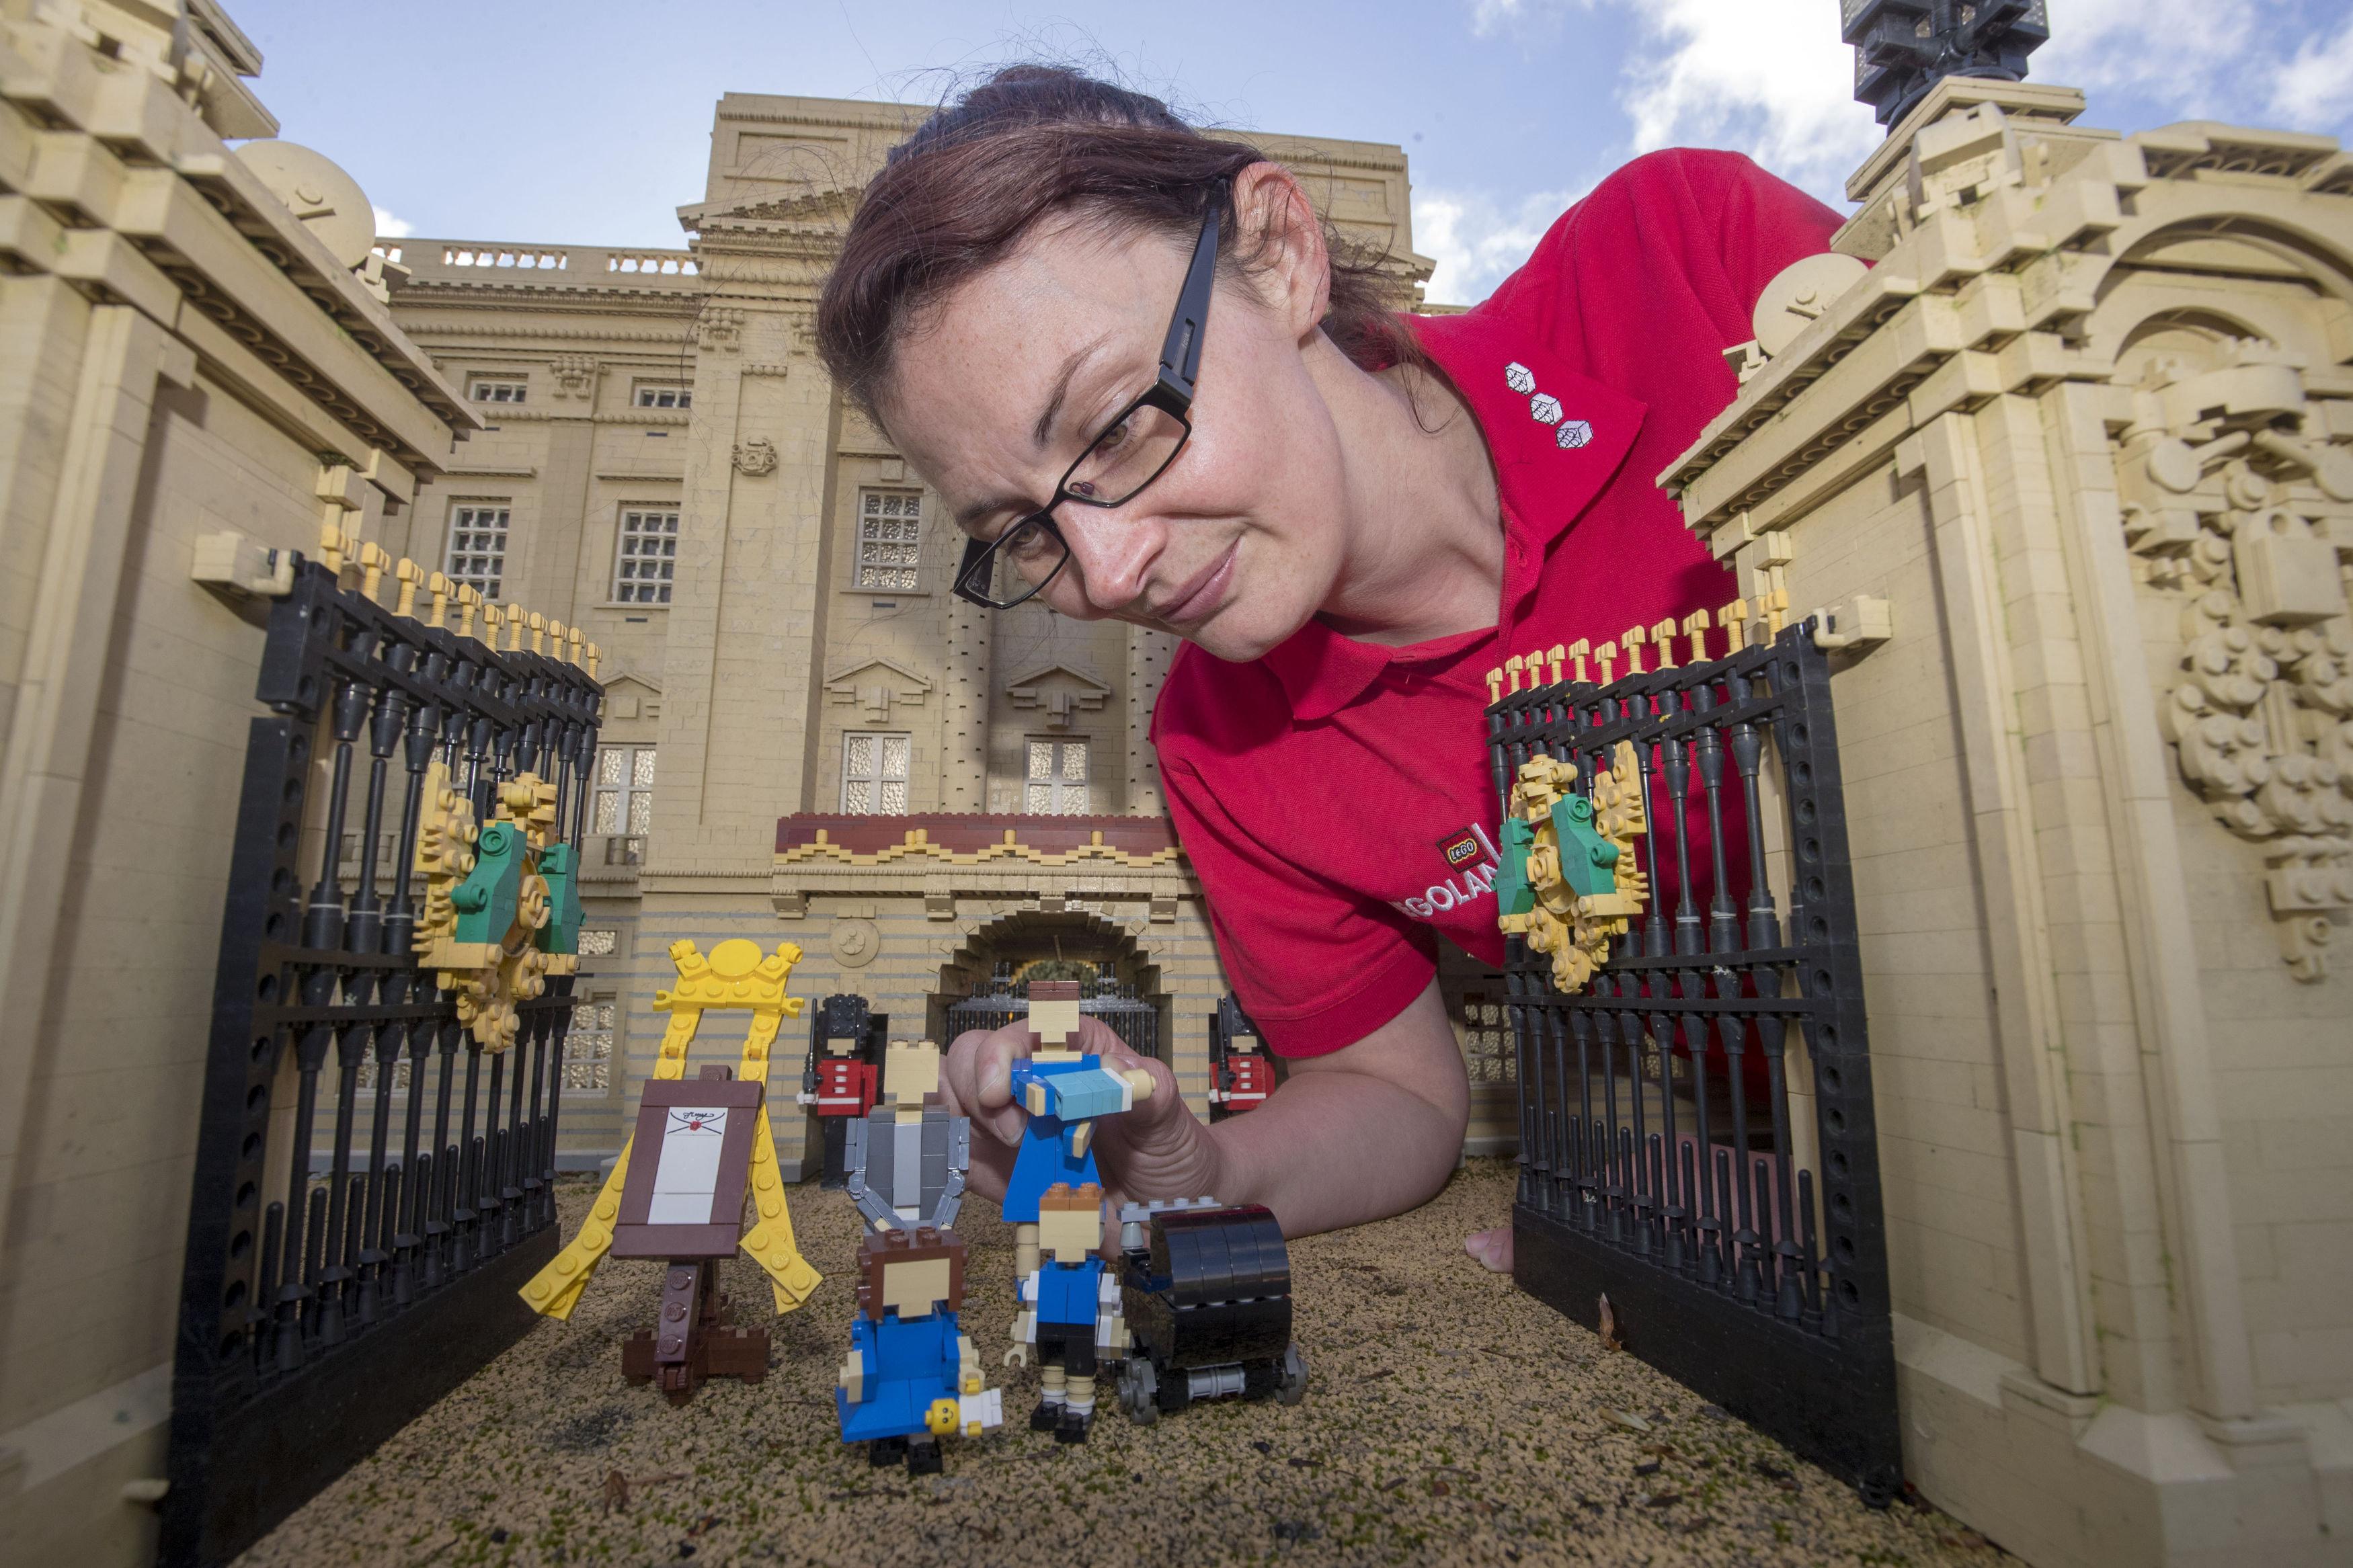 Model maker Kat James puts the finishing toucheson the Lego figures.